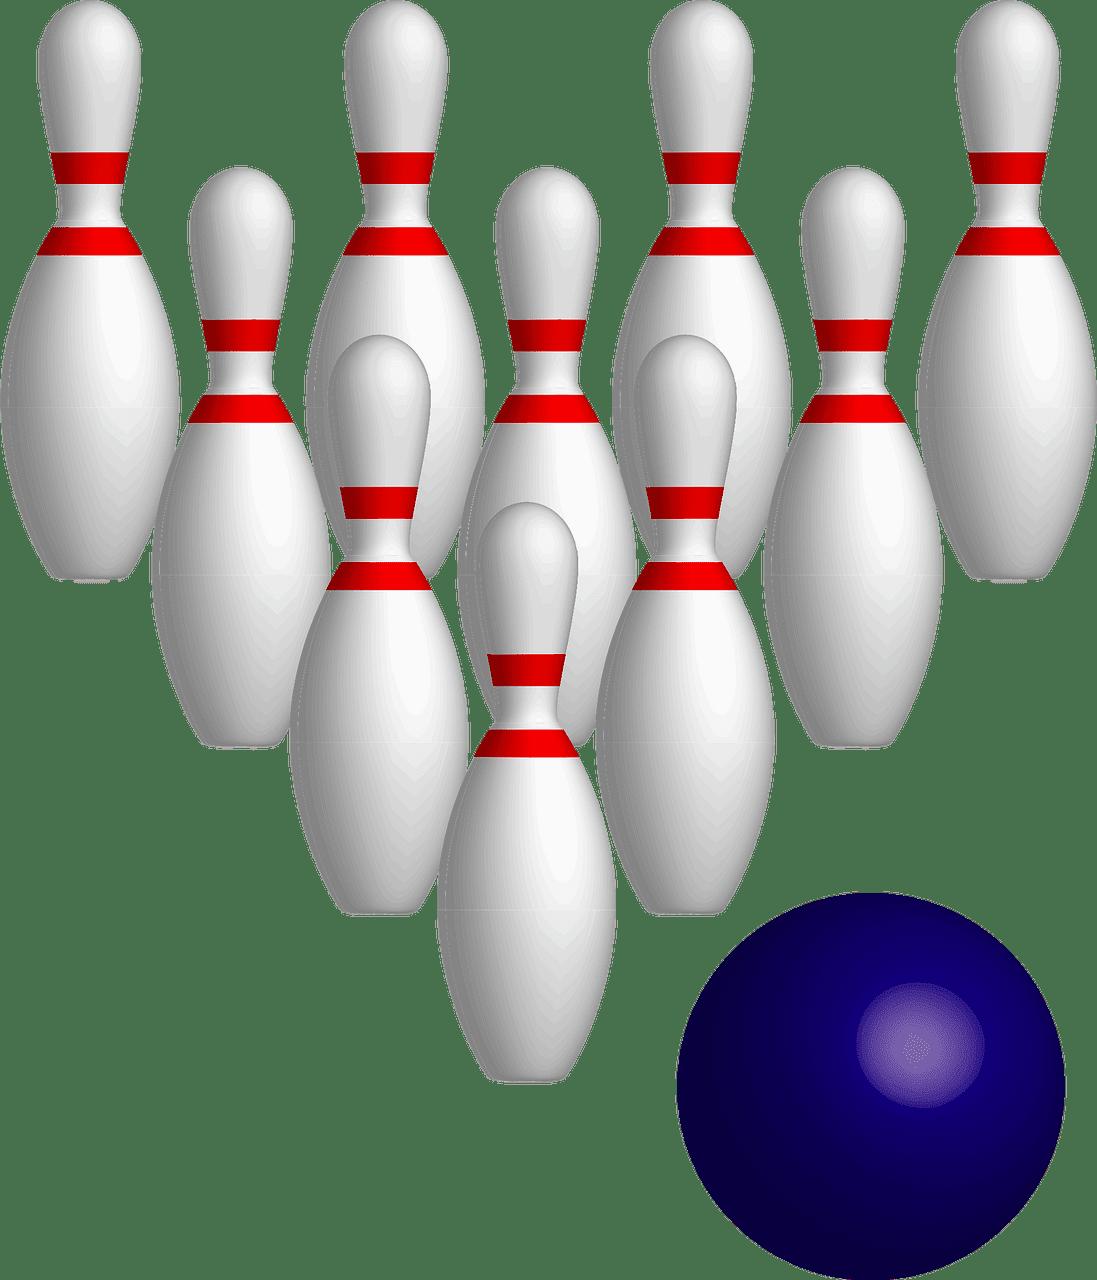 Bowling clipart transparent background 2